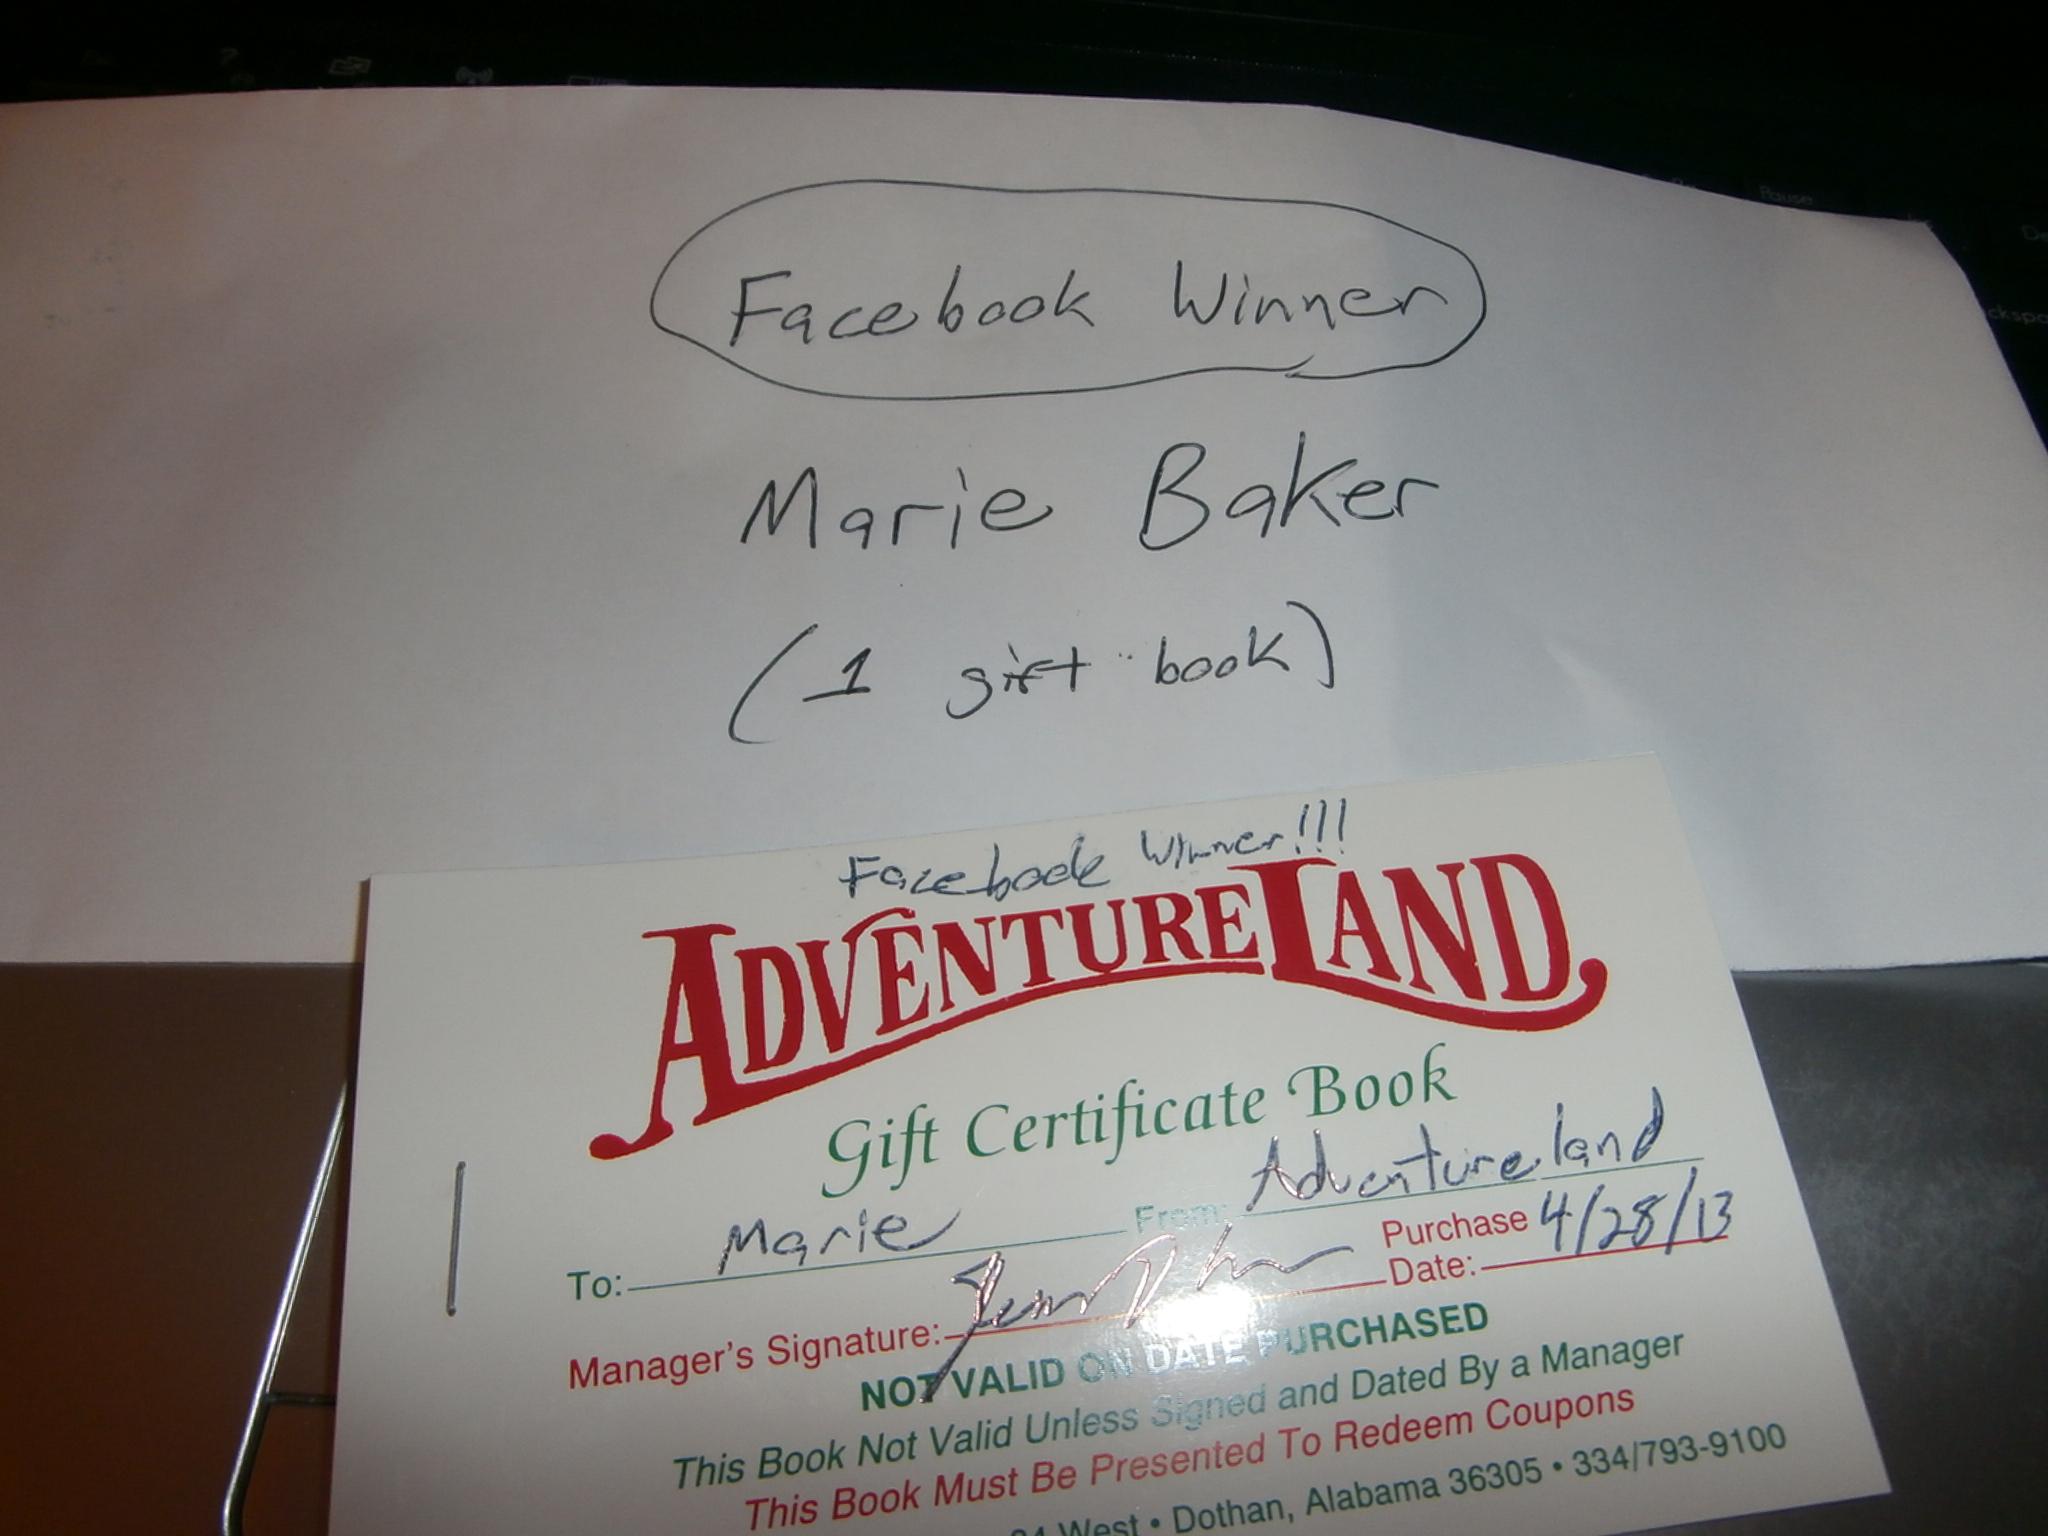 Adventureland park discount coupons